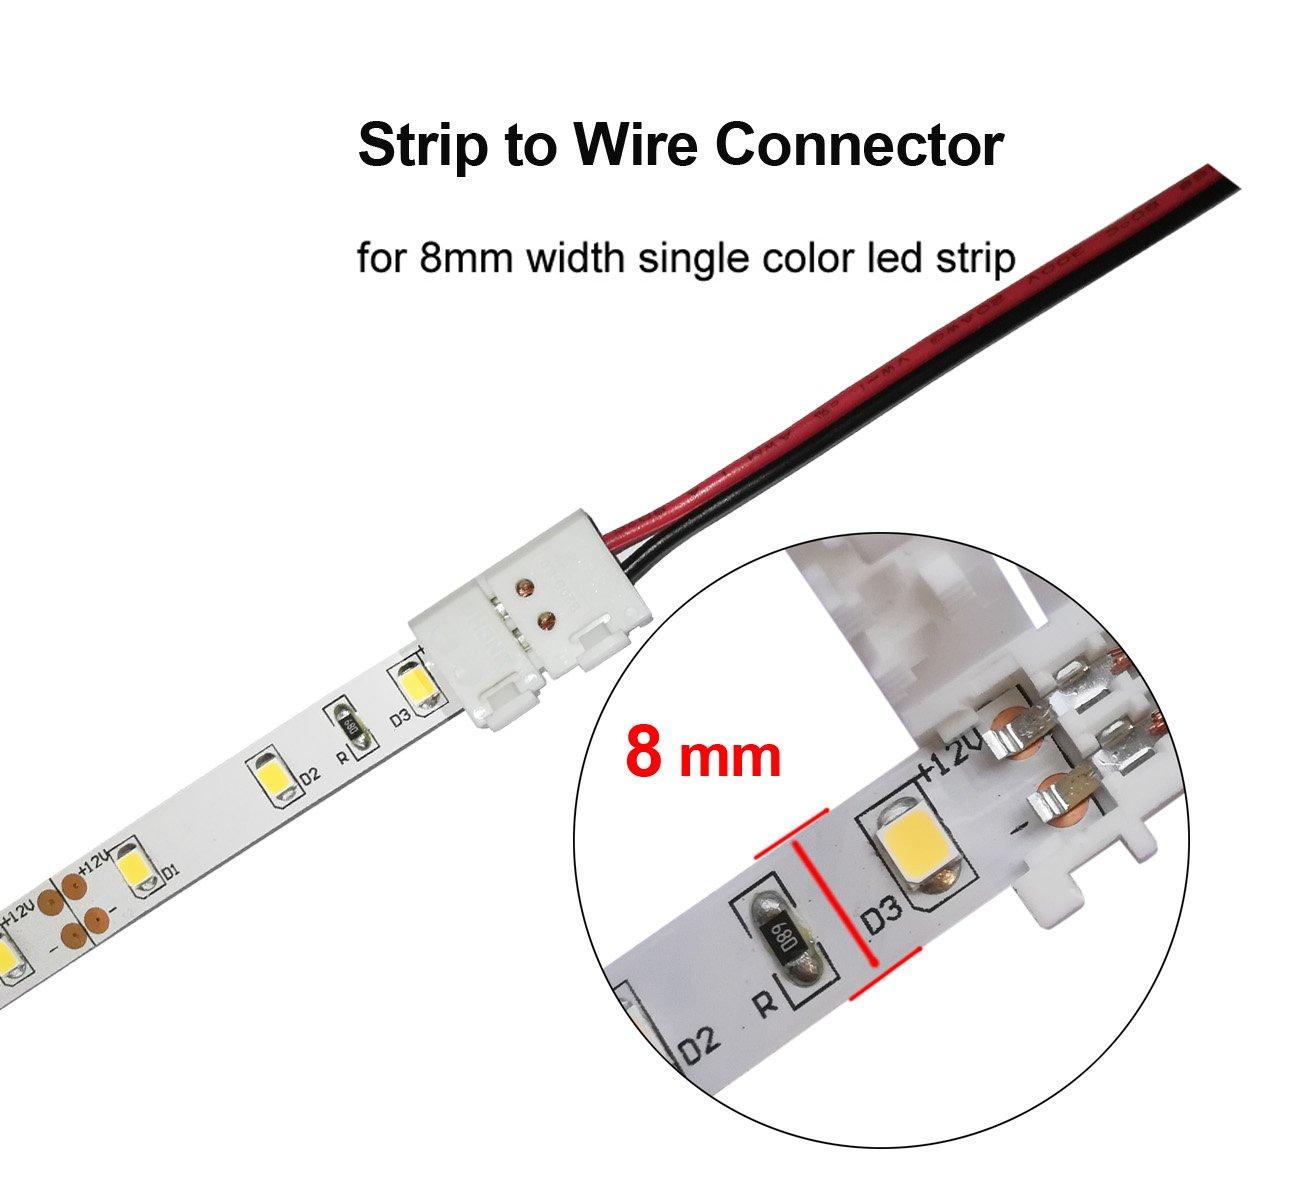 3528 2835 2 Pin 8mm LED light Connectors